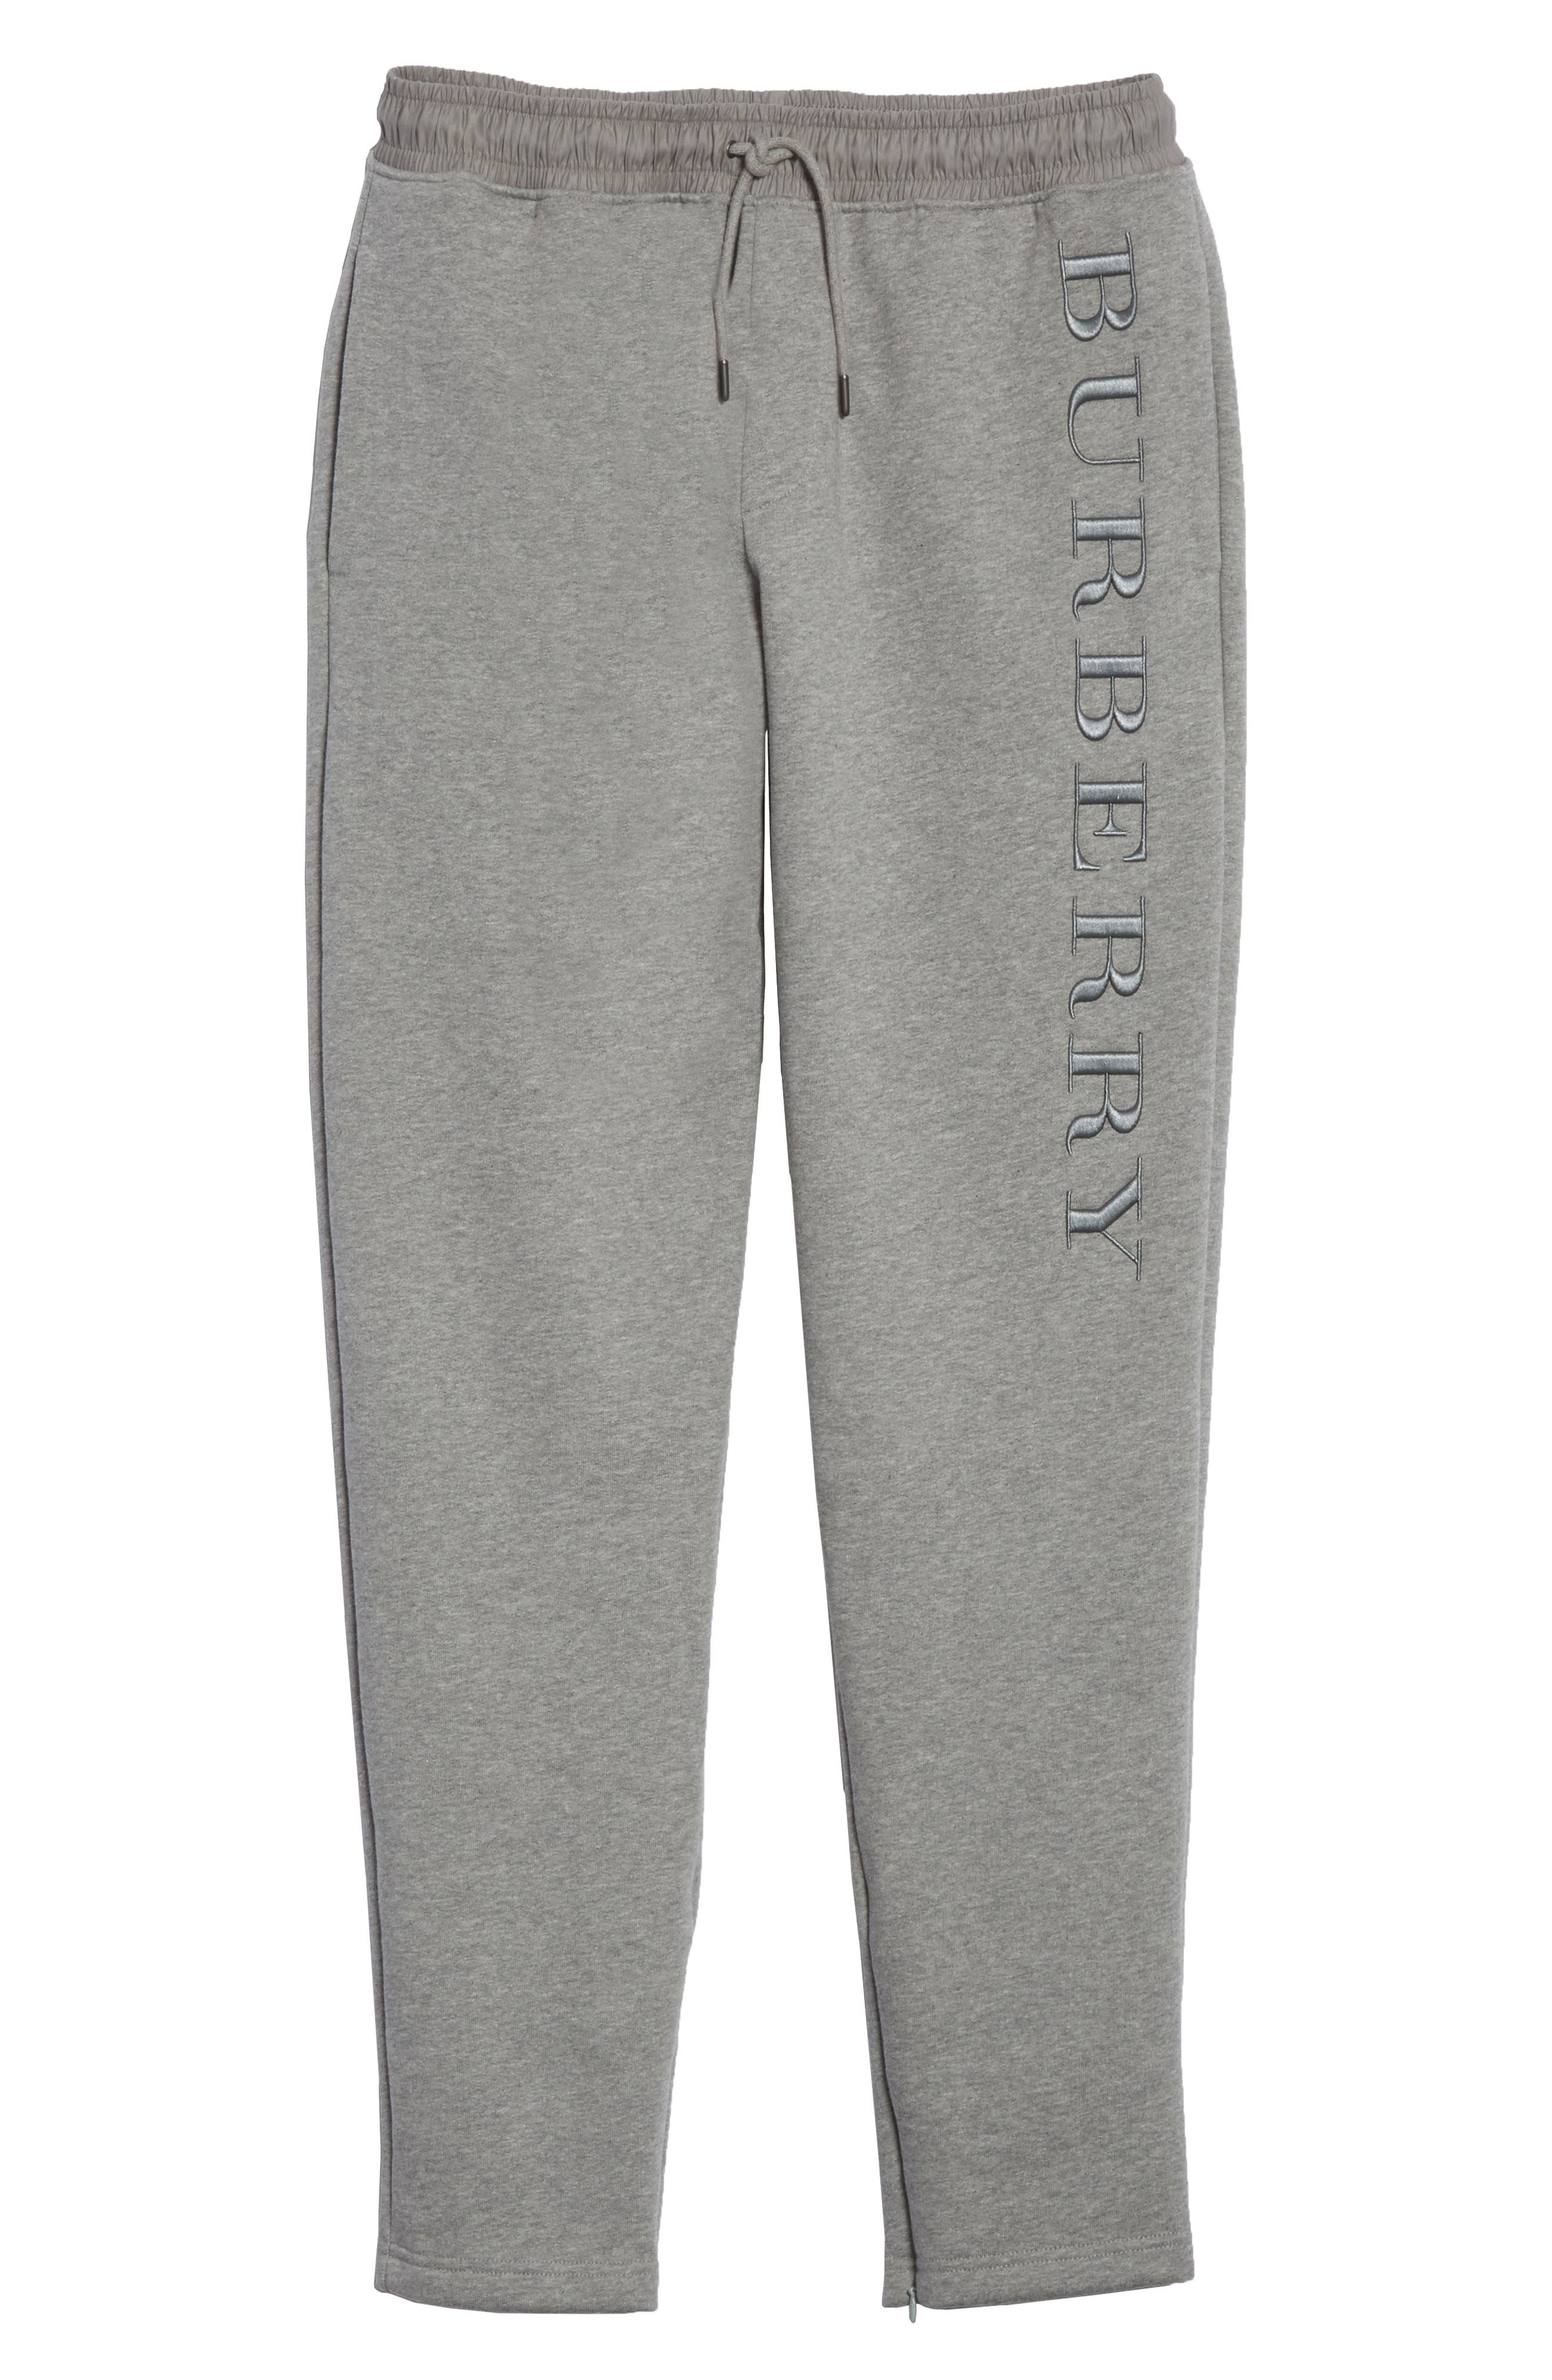 Nickford Lounge Pants,                             Alternate thumbnail 6, color,                             Pale Grey Melange